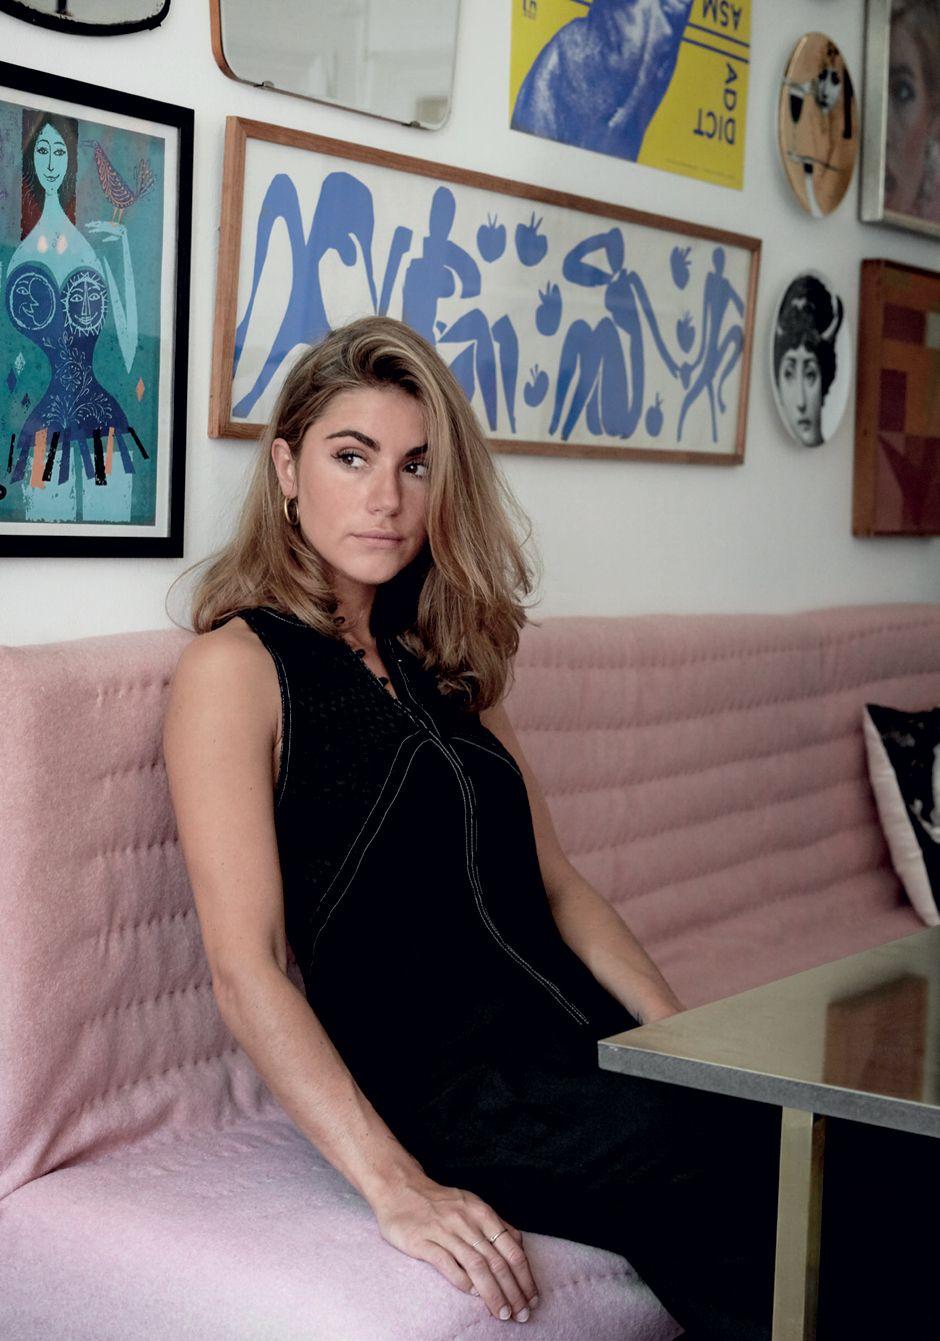 Photo of Den 22 år gamle designeren Cecilie Jørgensen, som står bak merkevaren & # 39; Cecilie Copenh …